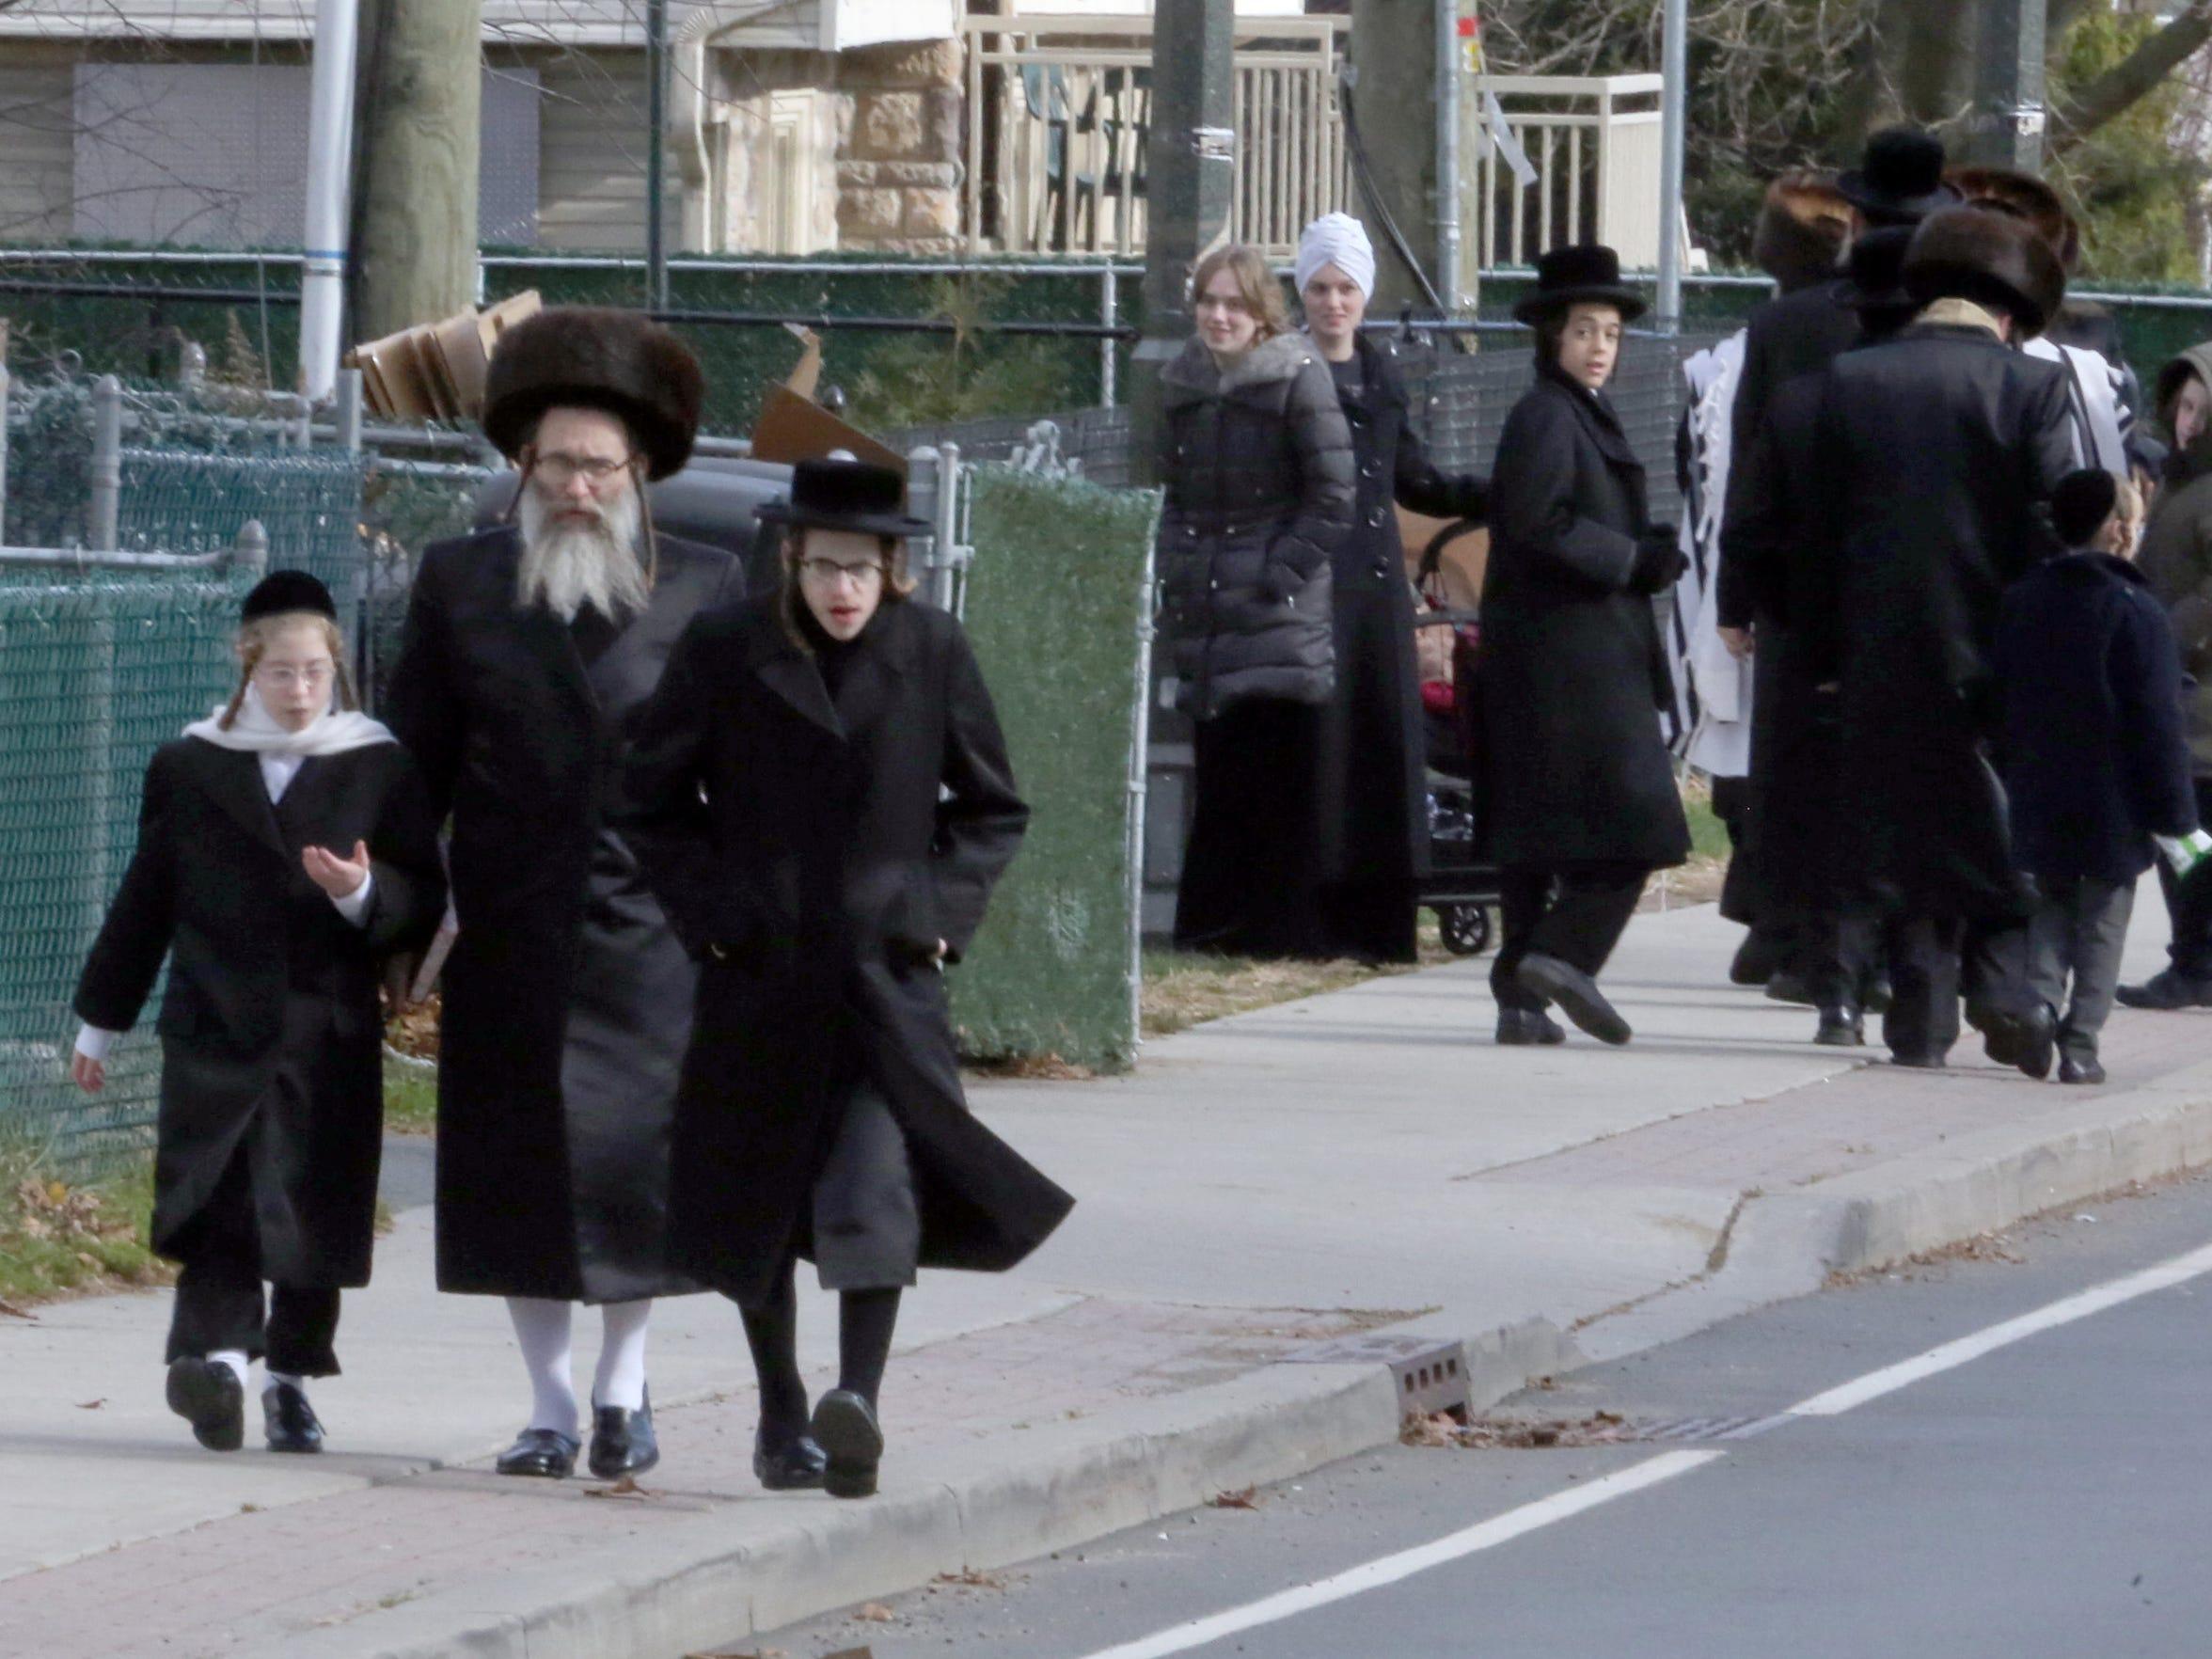 People walking home after Saturday afternoon Sabbath